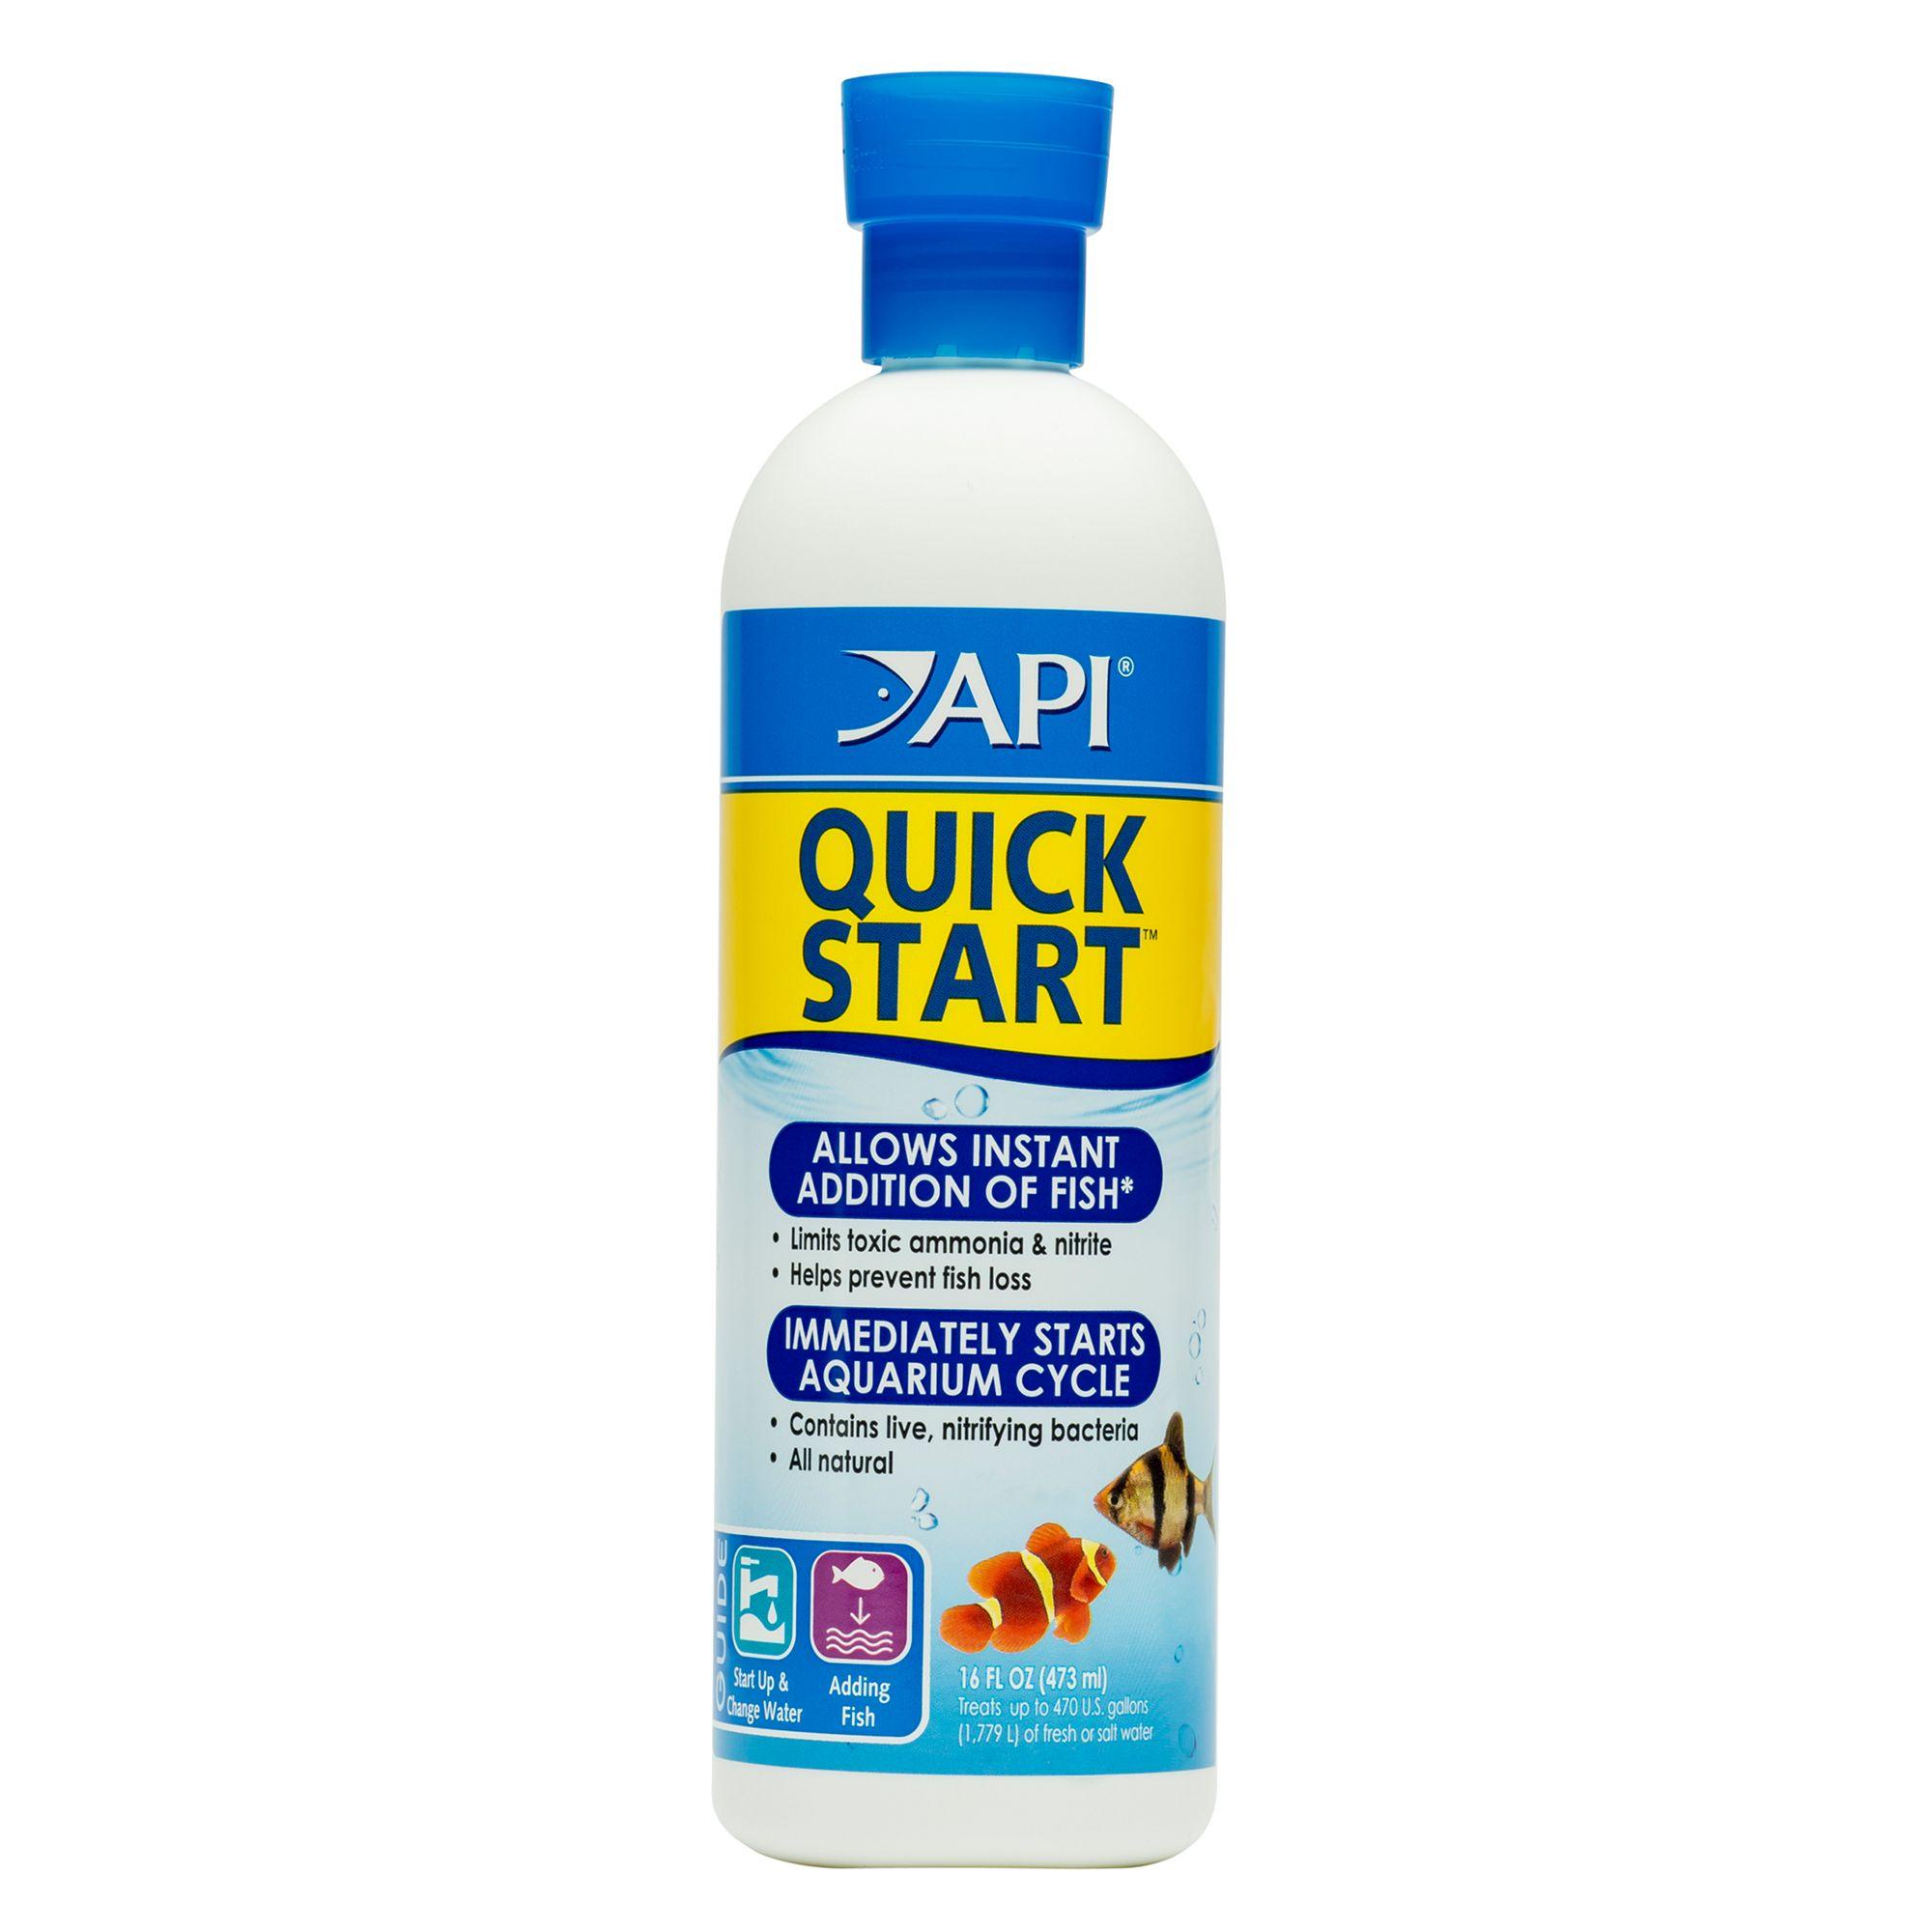 Api Quick Start Aquarium Cycling Water Conditioner size: 16 Fl Oz